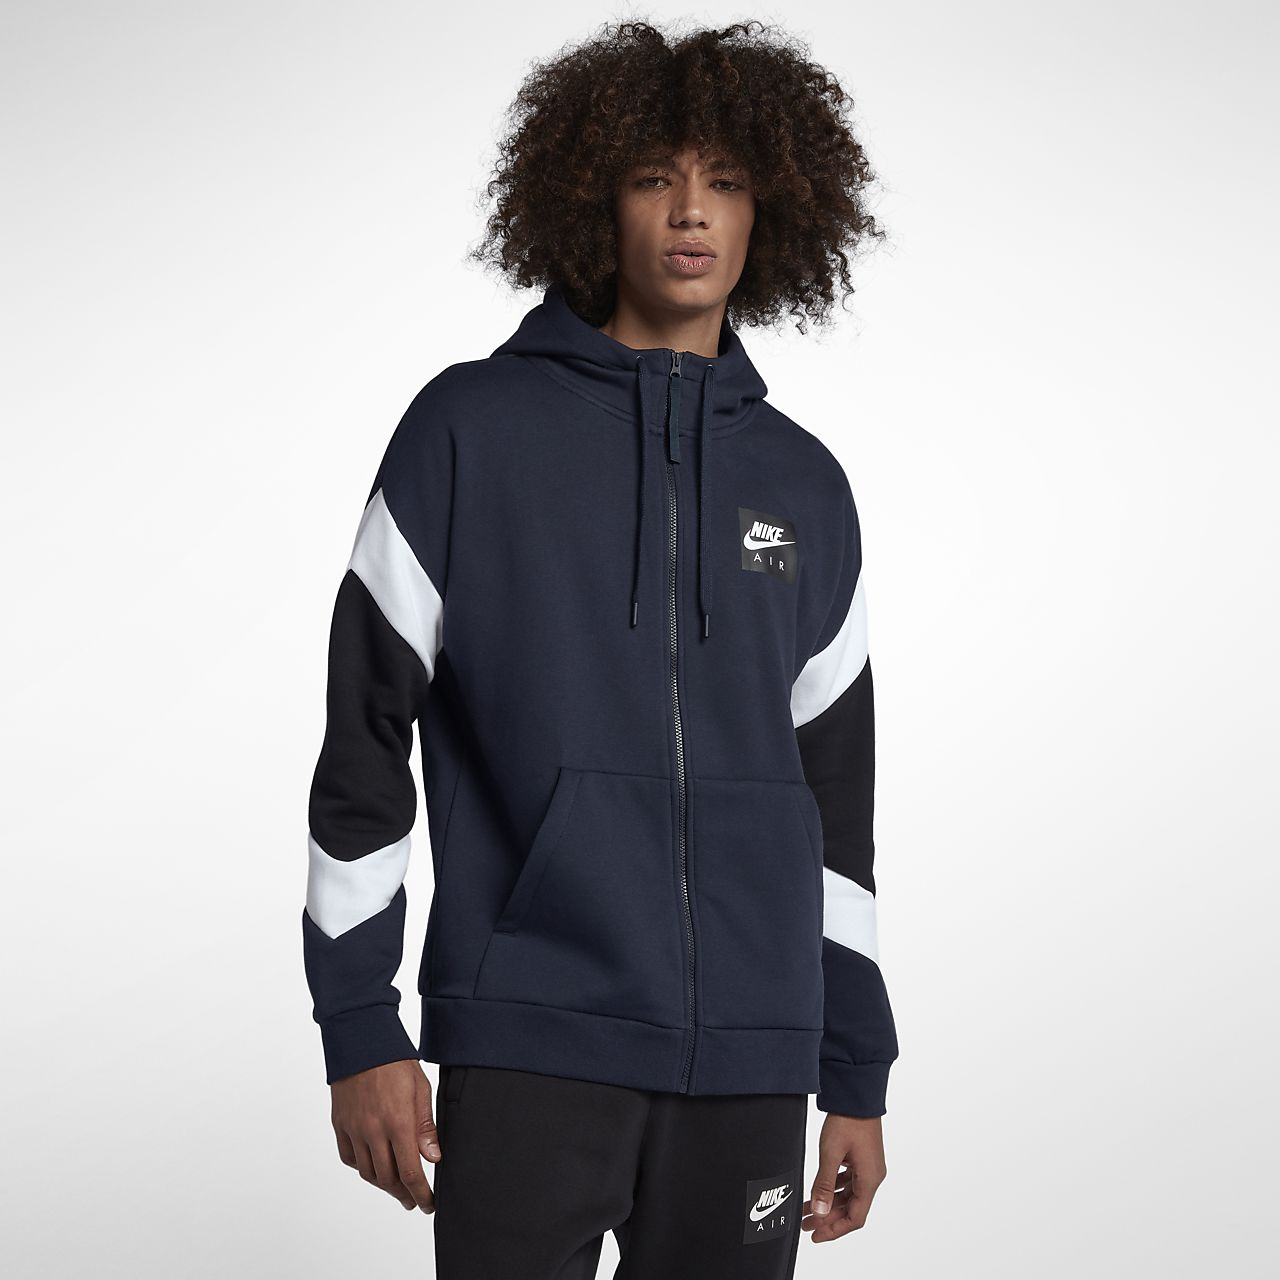 286c1e51862 ... Sudadera con capucha de cierre completo para hombre Nike Sportswear Air